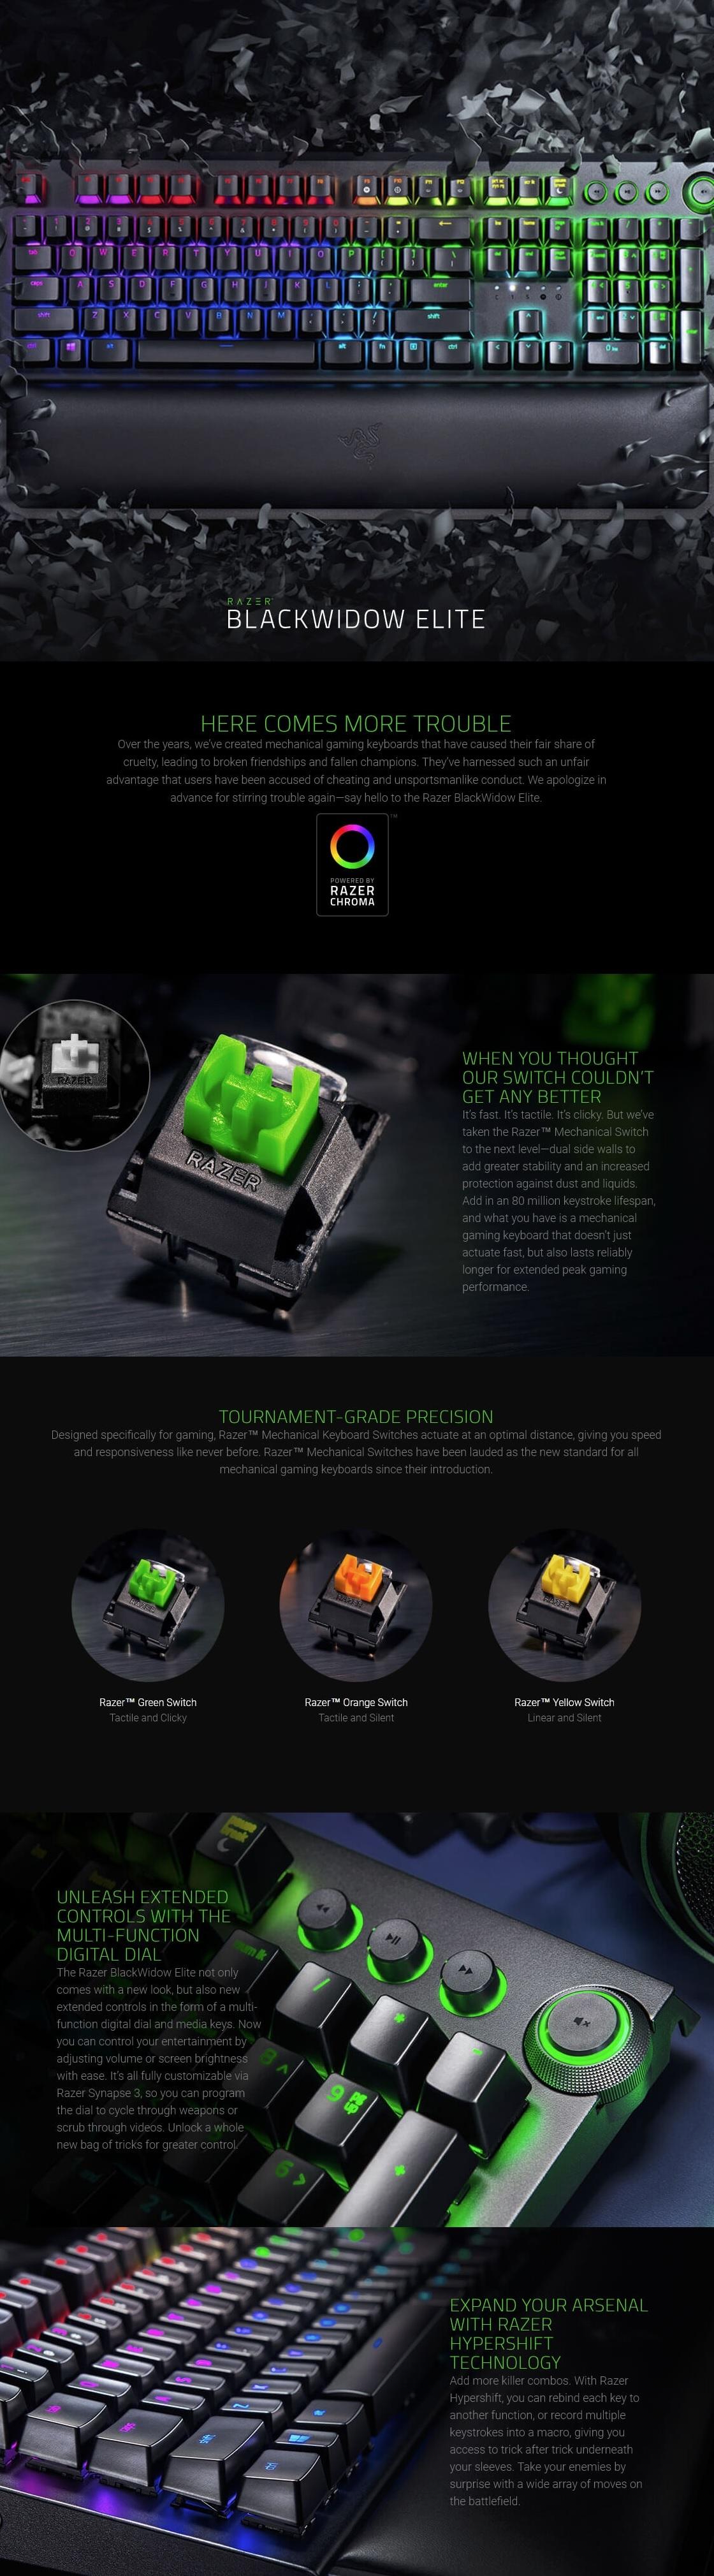 Razer Blackwidow Elite Mechanical Gaming Keyboard Green Switch